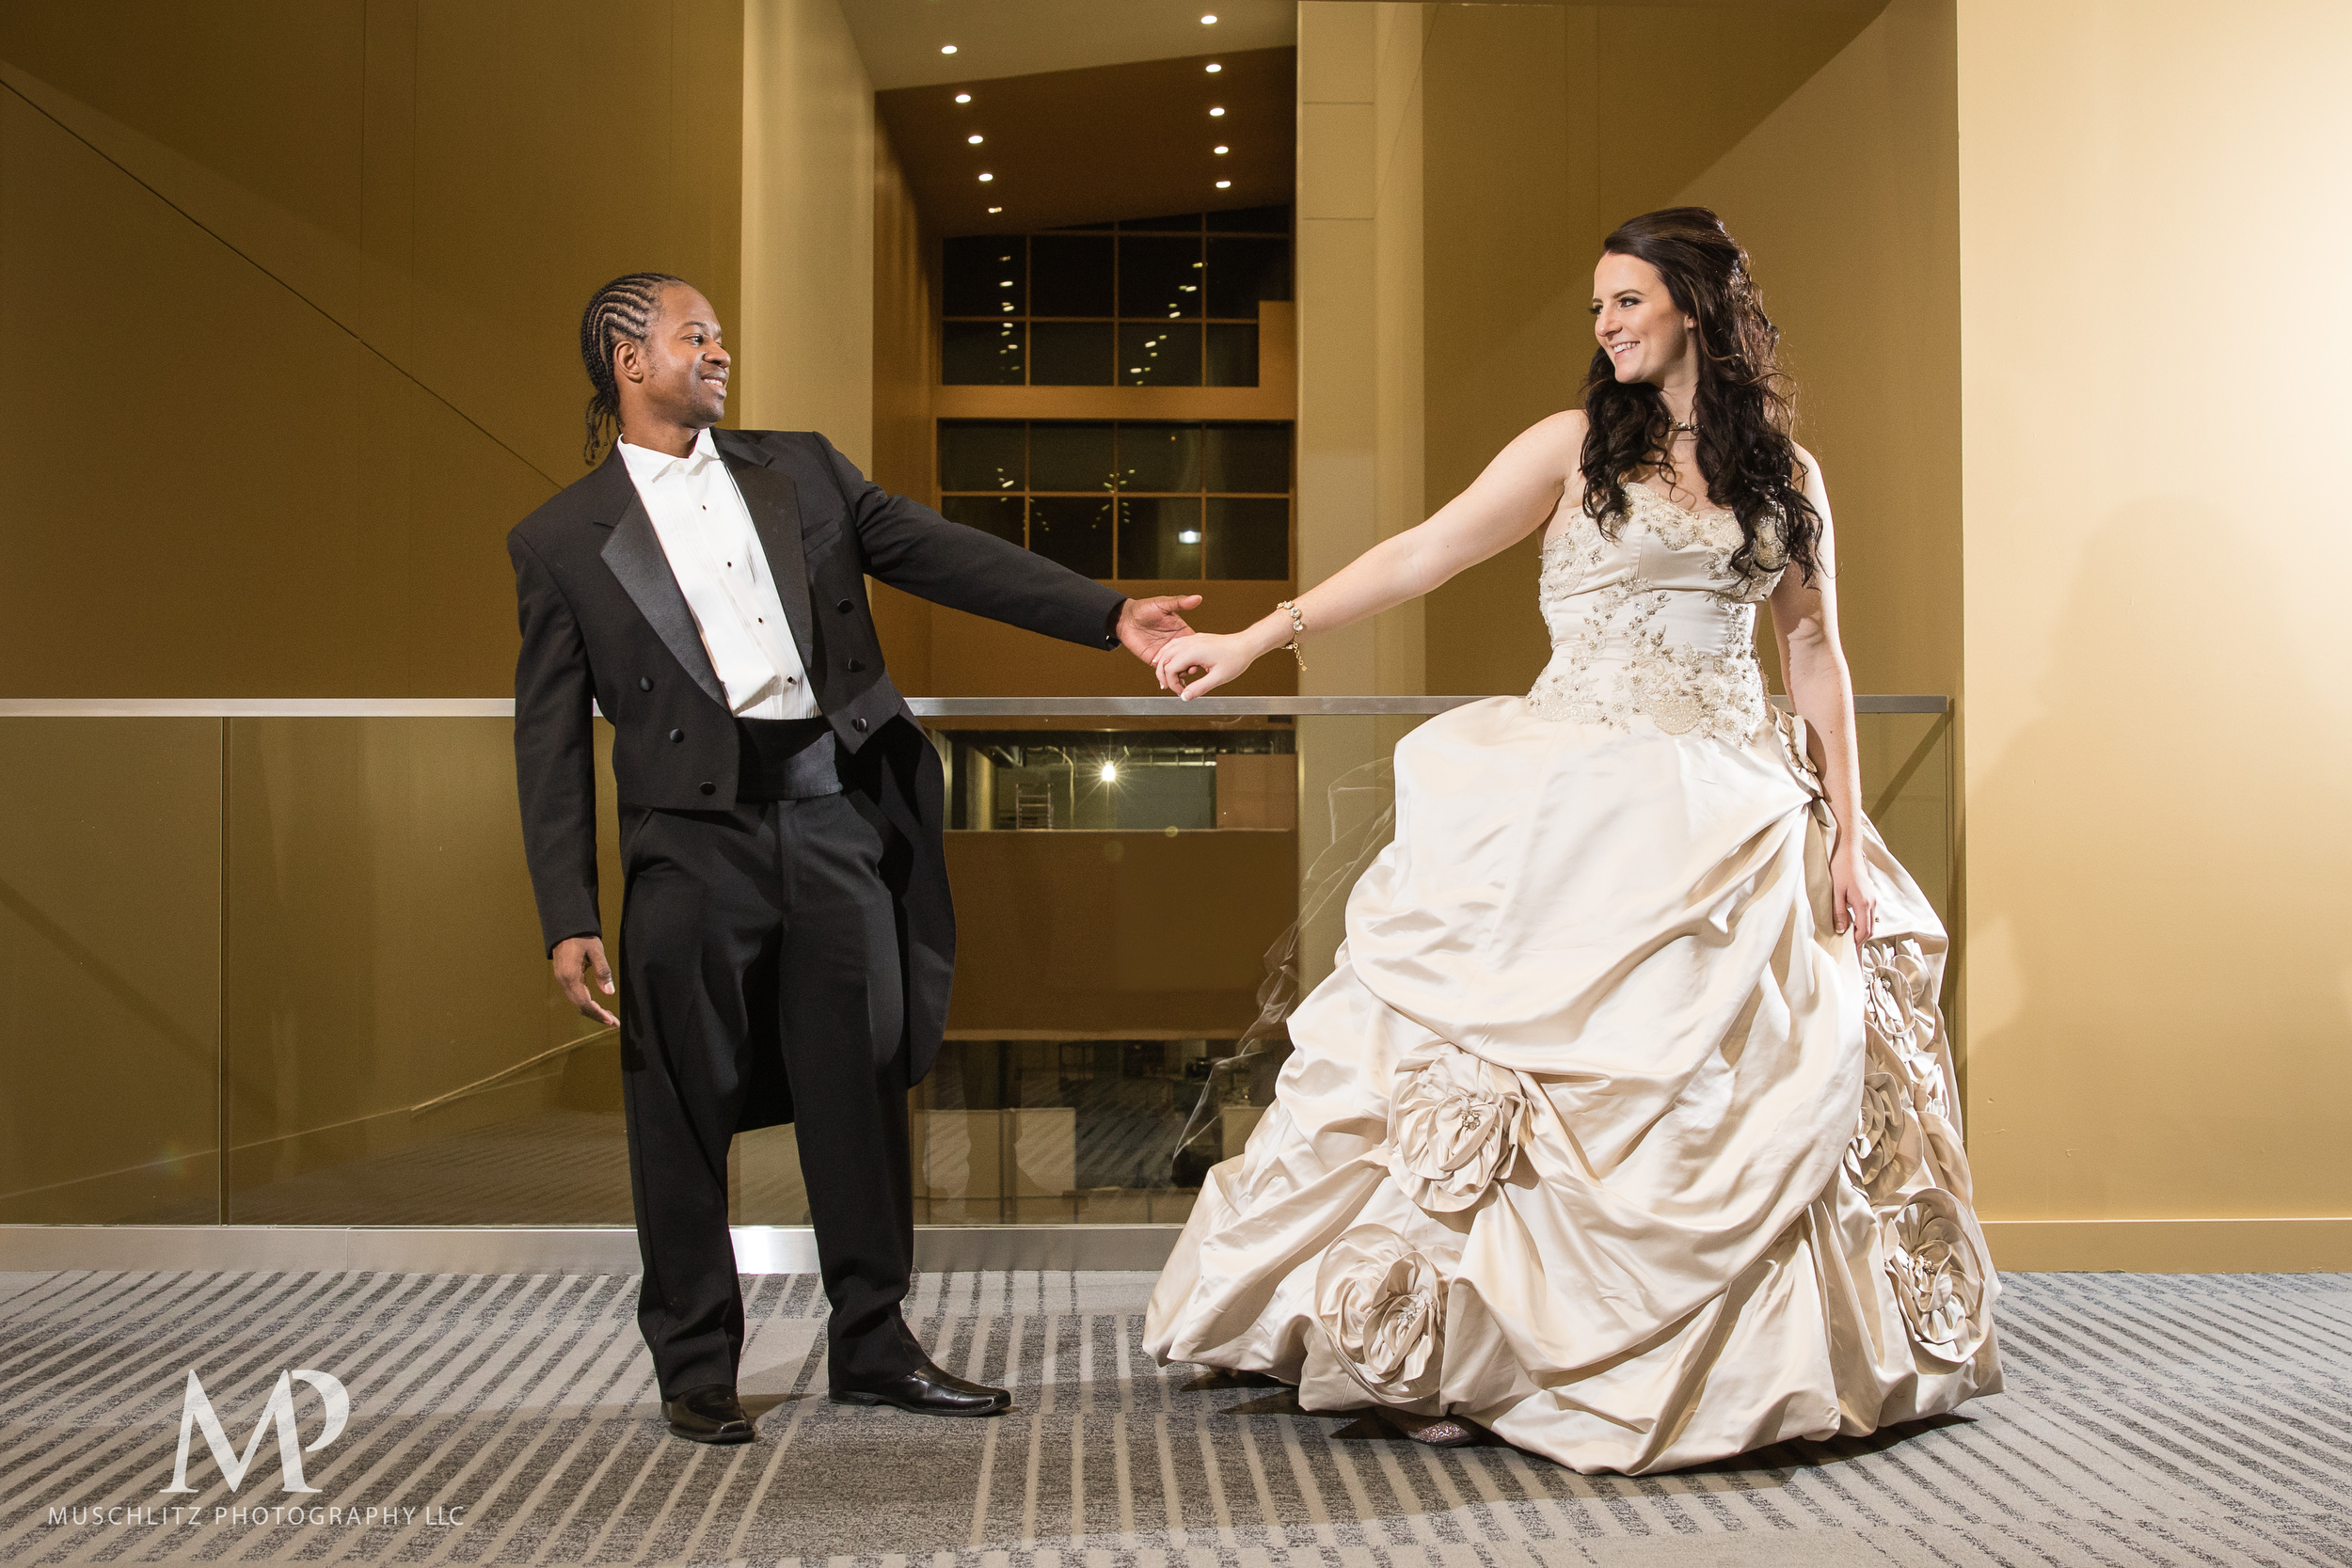 greater-columbus-convention-center-winter-wedding-ceremony-reception-portraits-columbus-ohio-muschlitz-photography-054.JPG